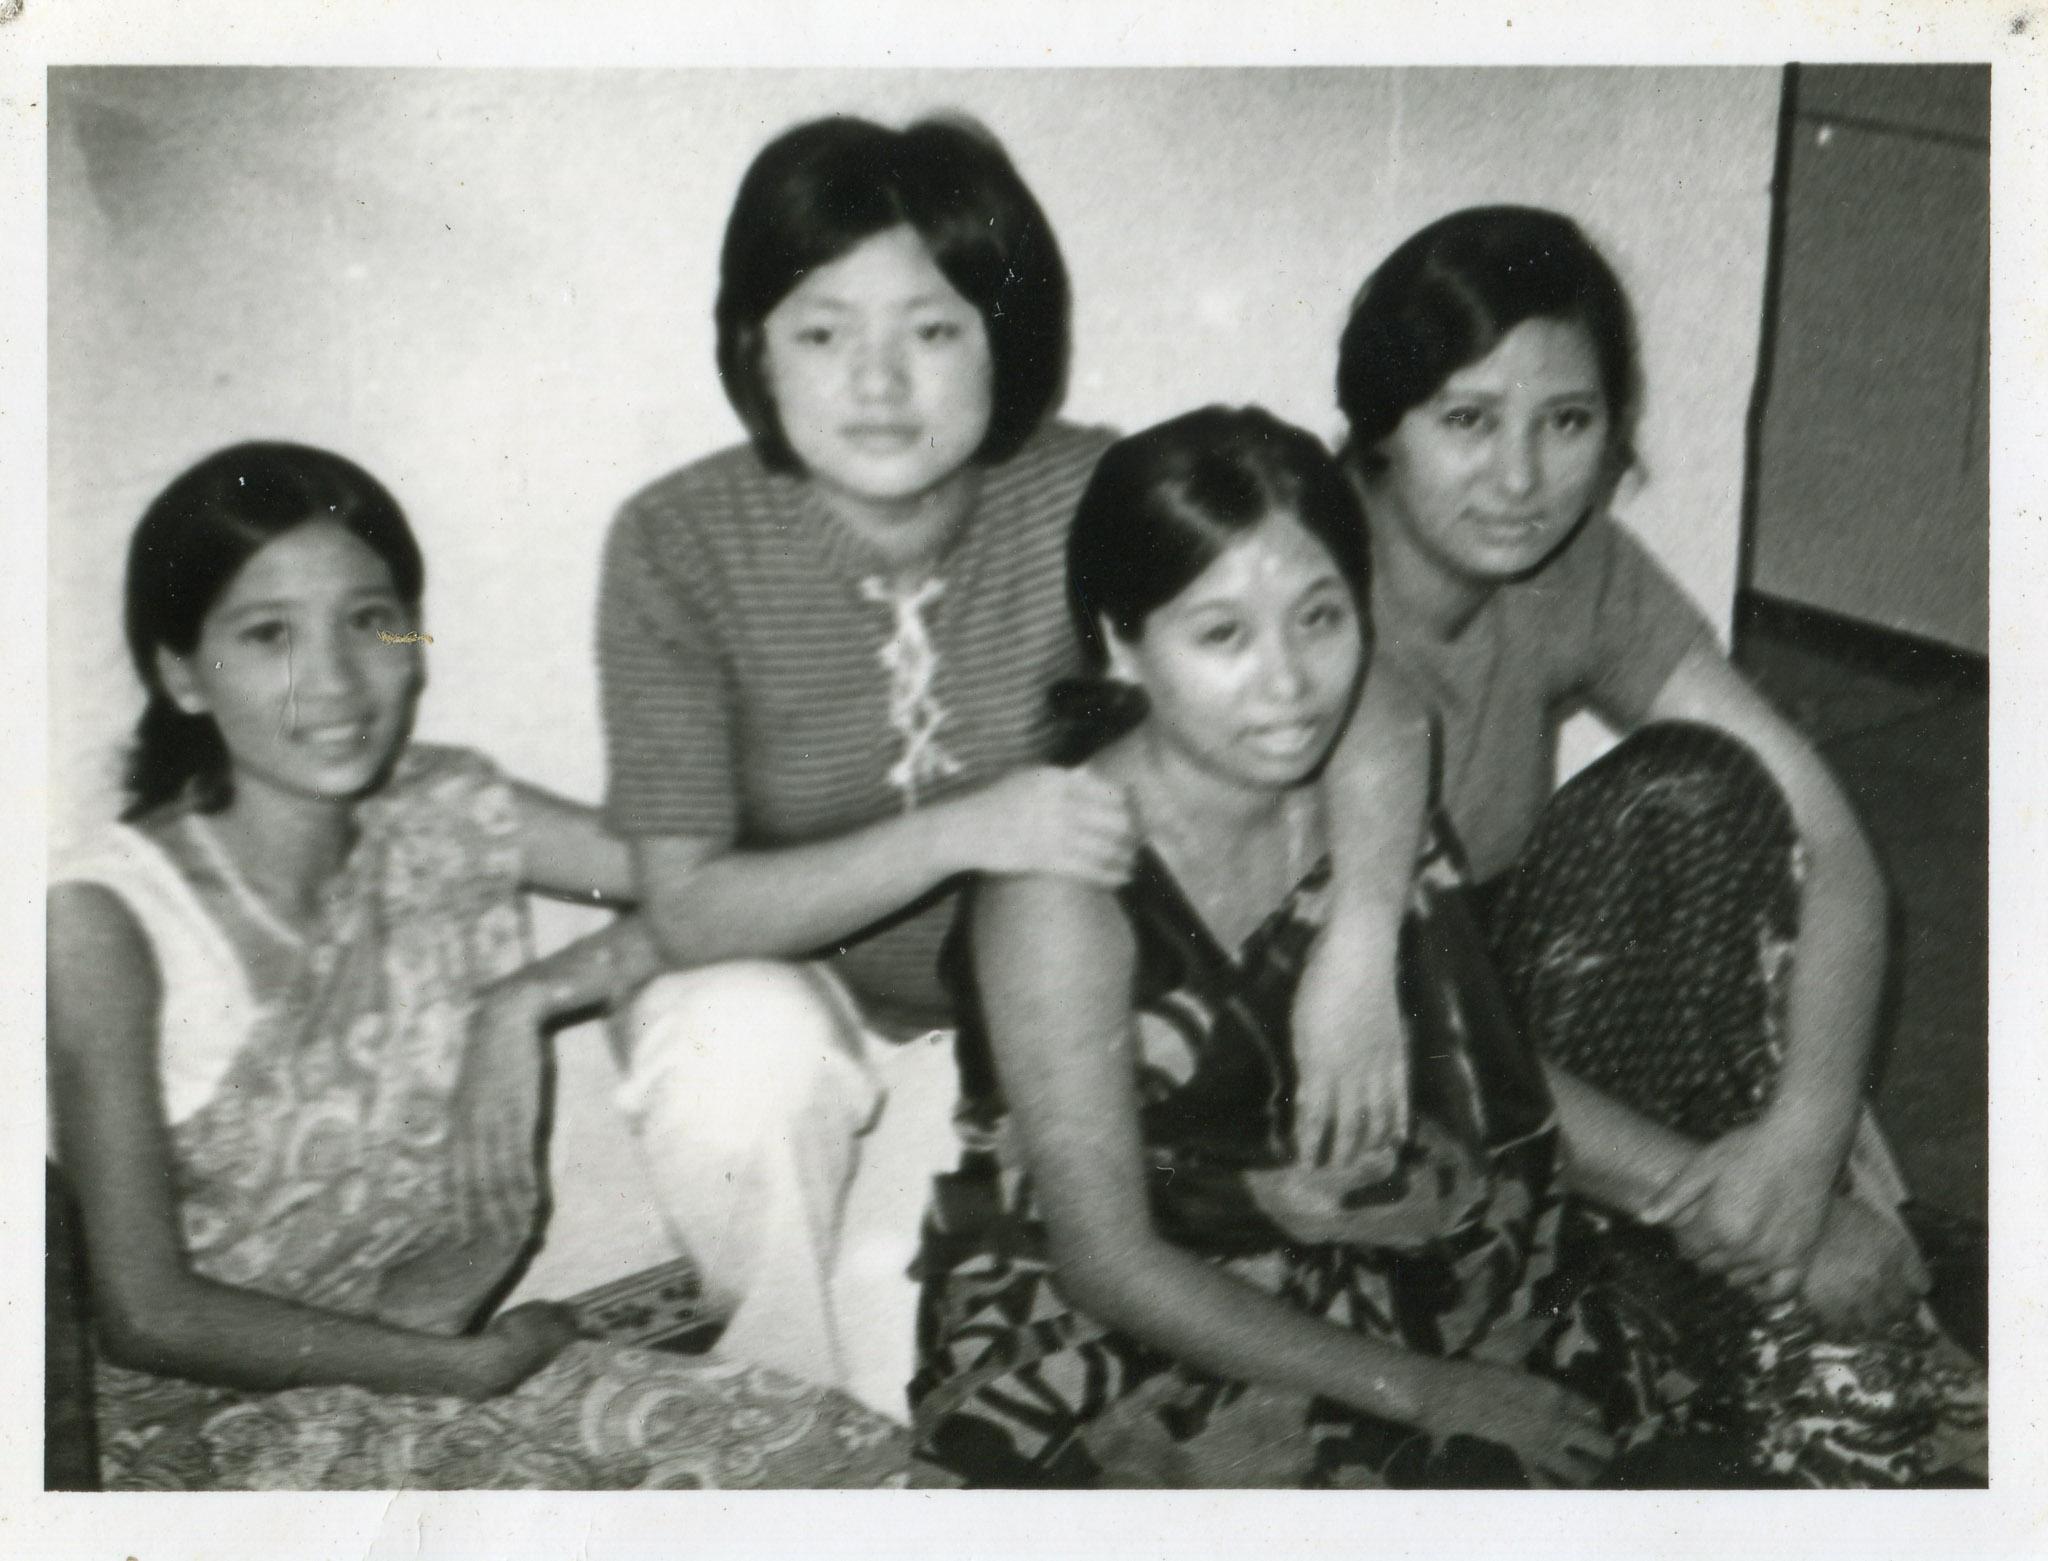 singapore-gurkhas-archive-photo-museum-zakaria-zainal-32.jpg